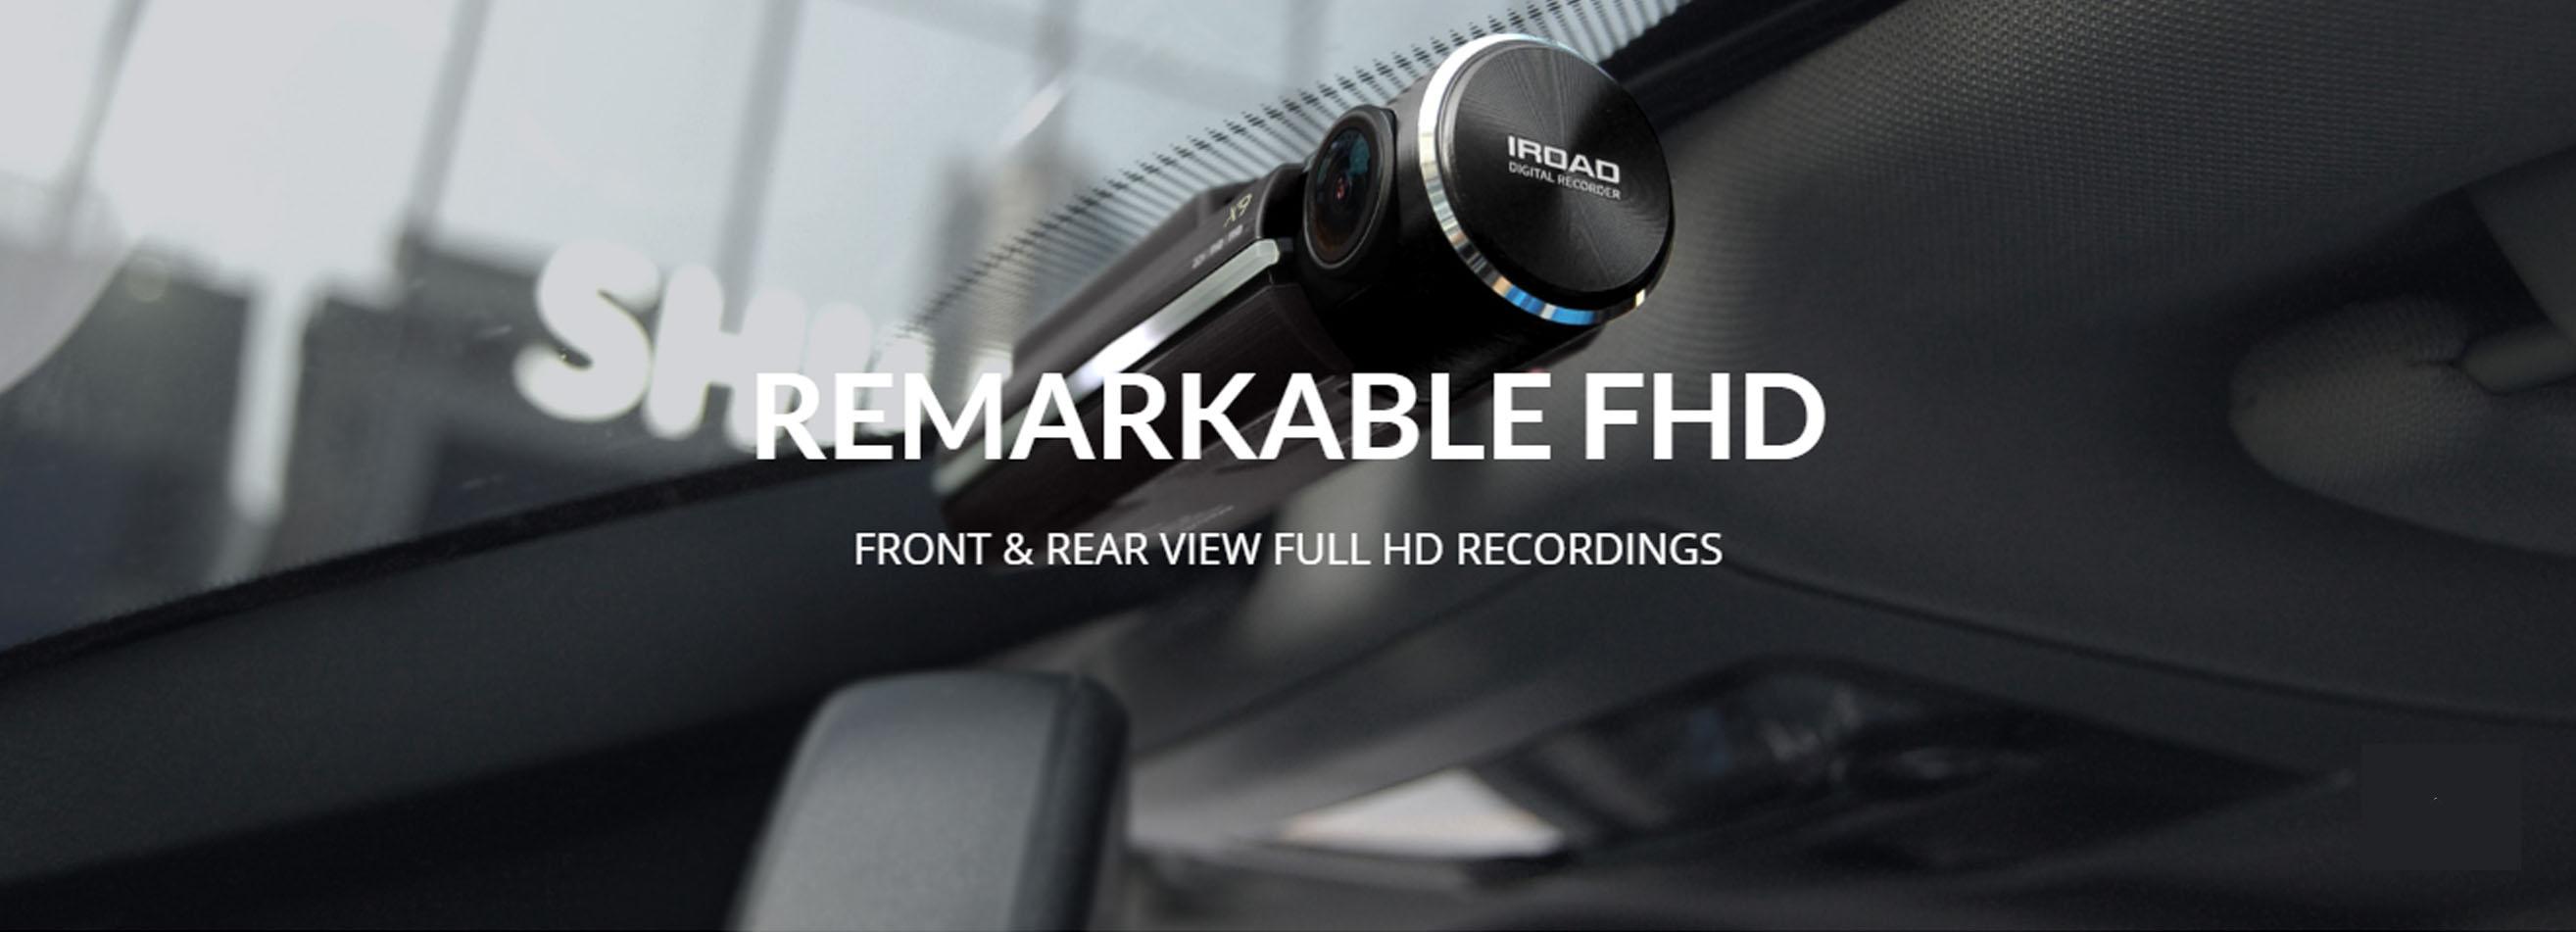 دوربین خودرو - یکتانگر